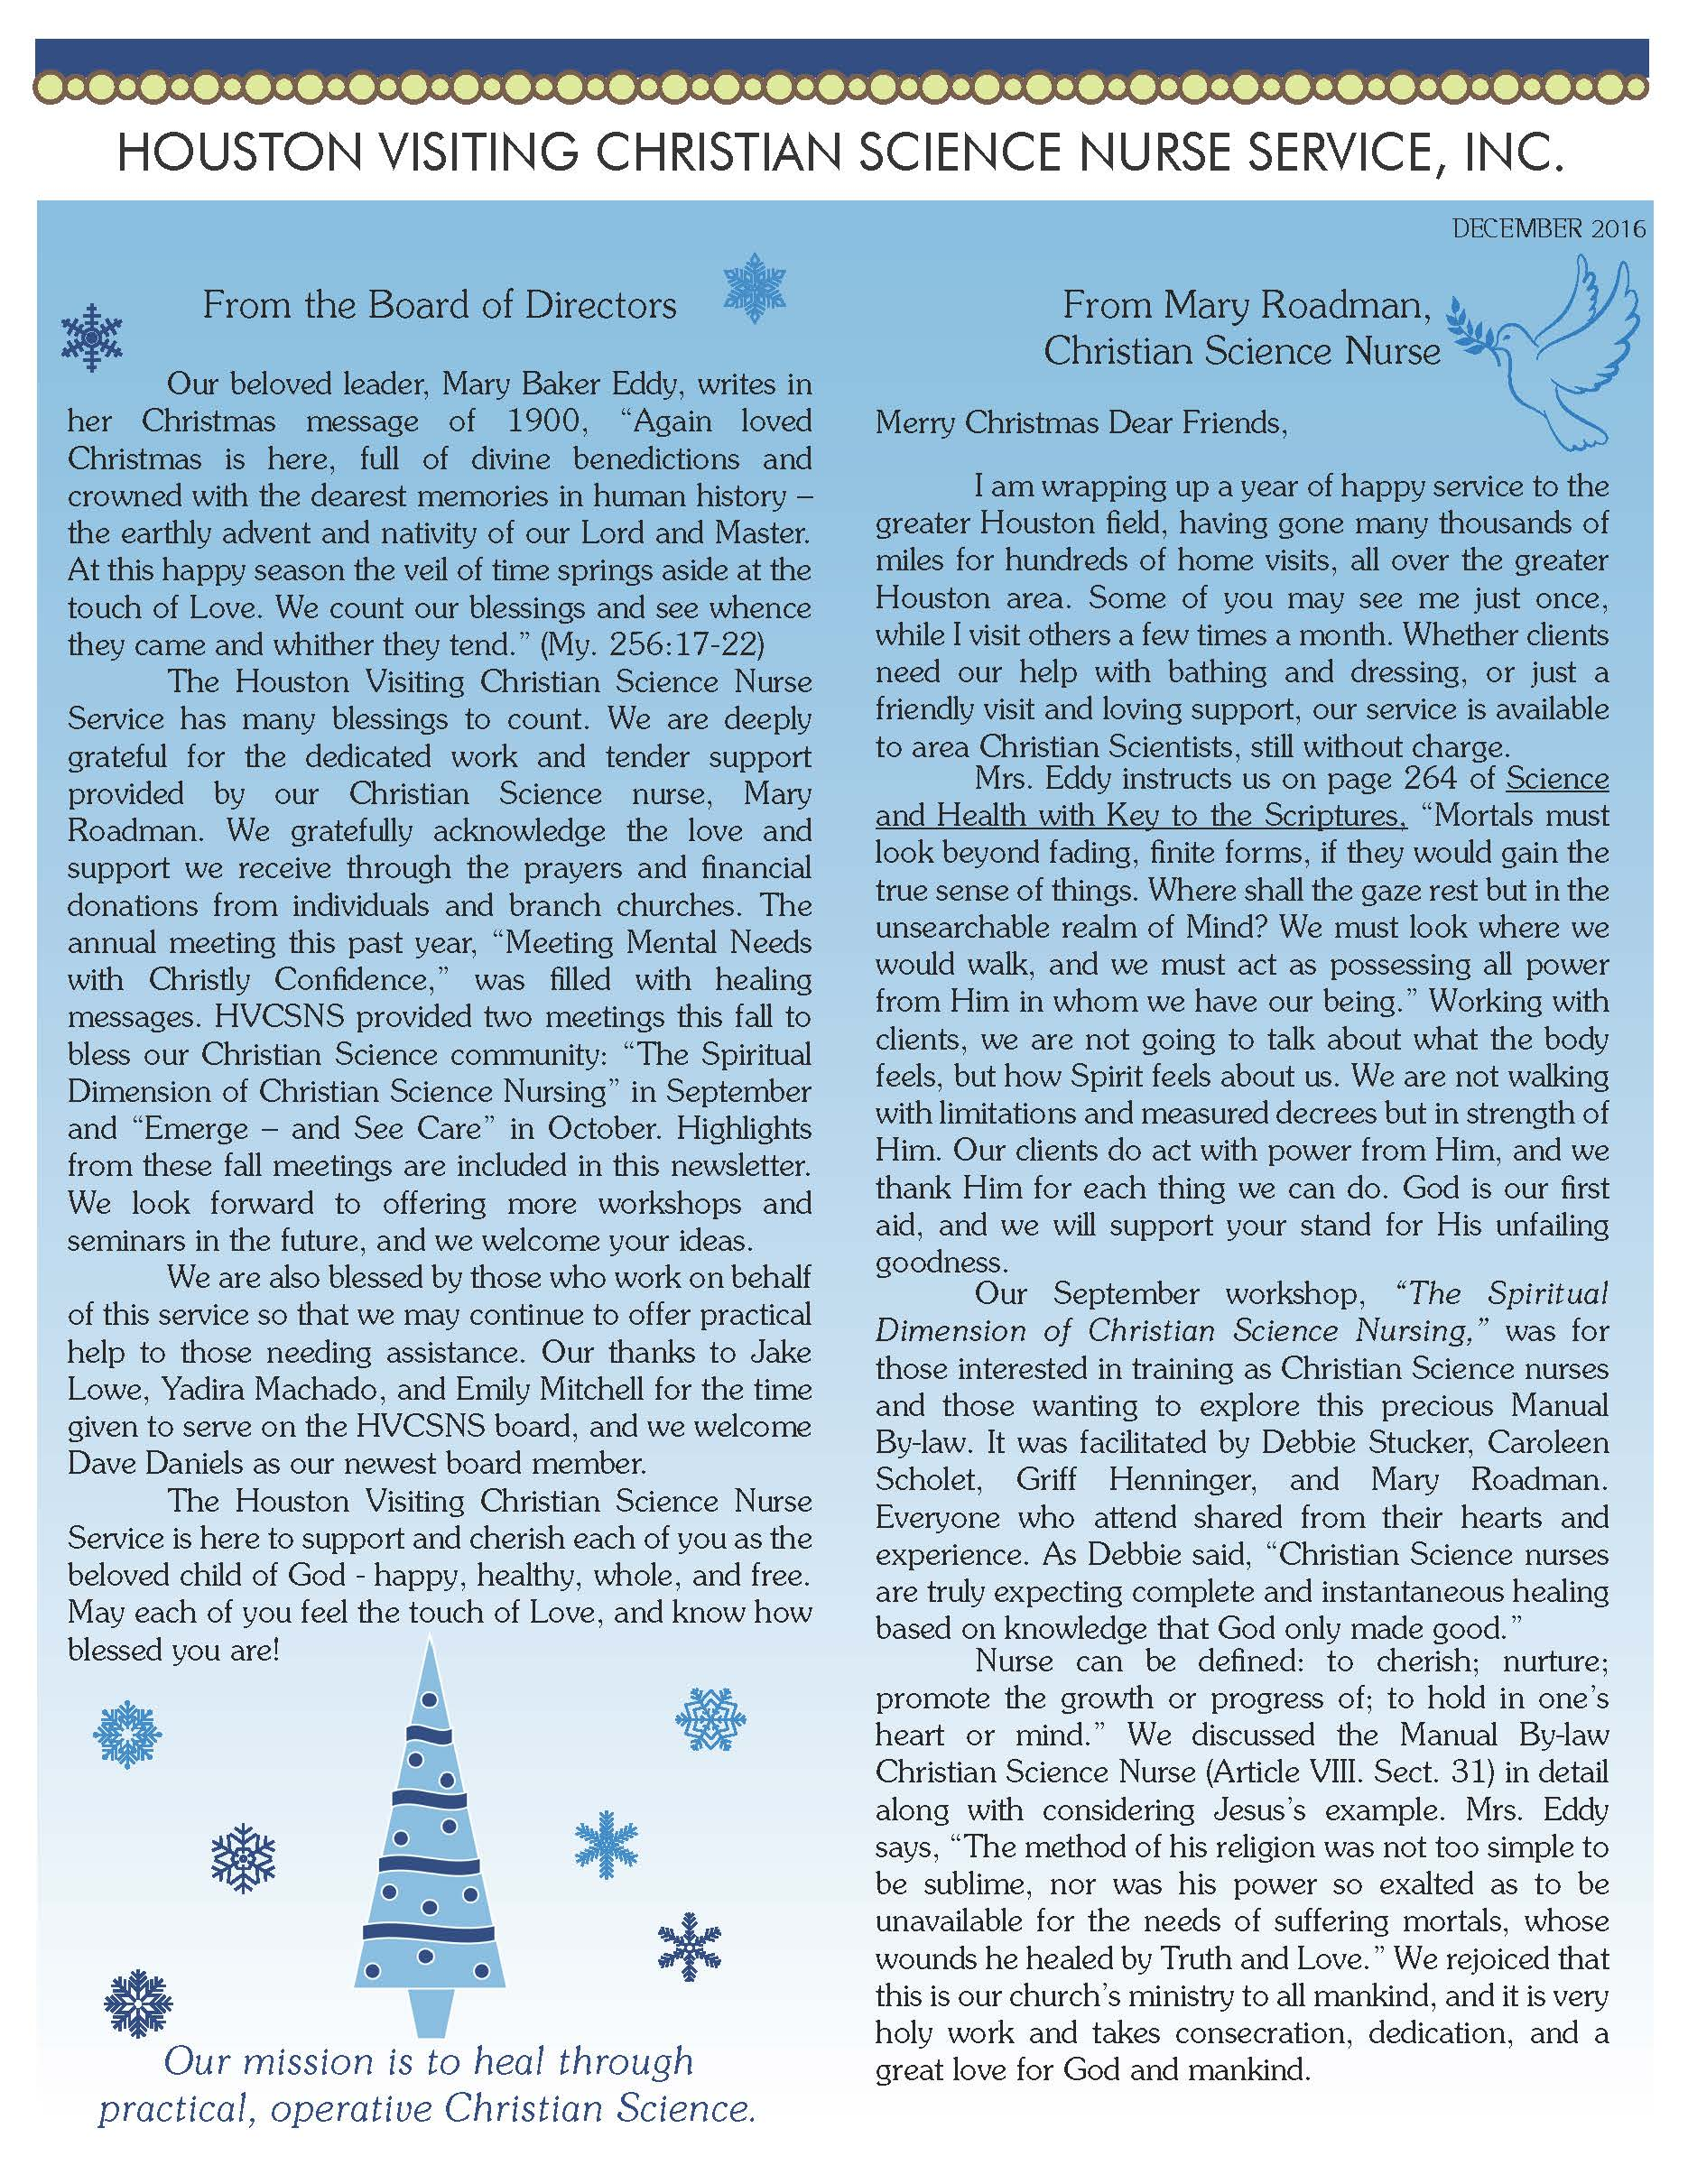 https://christianscienceheals.com/files/2017/02/December-2016-Newsletter.pdf